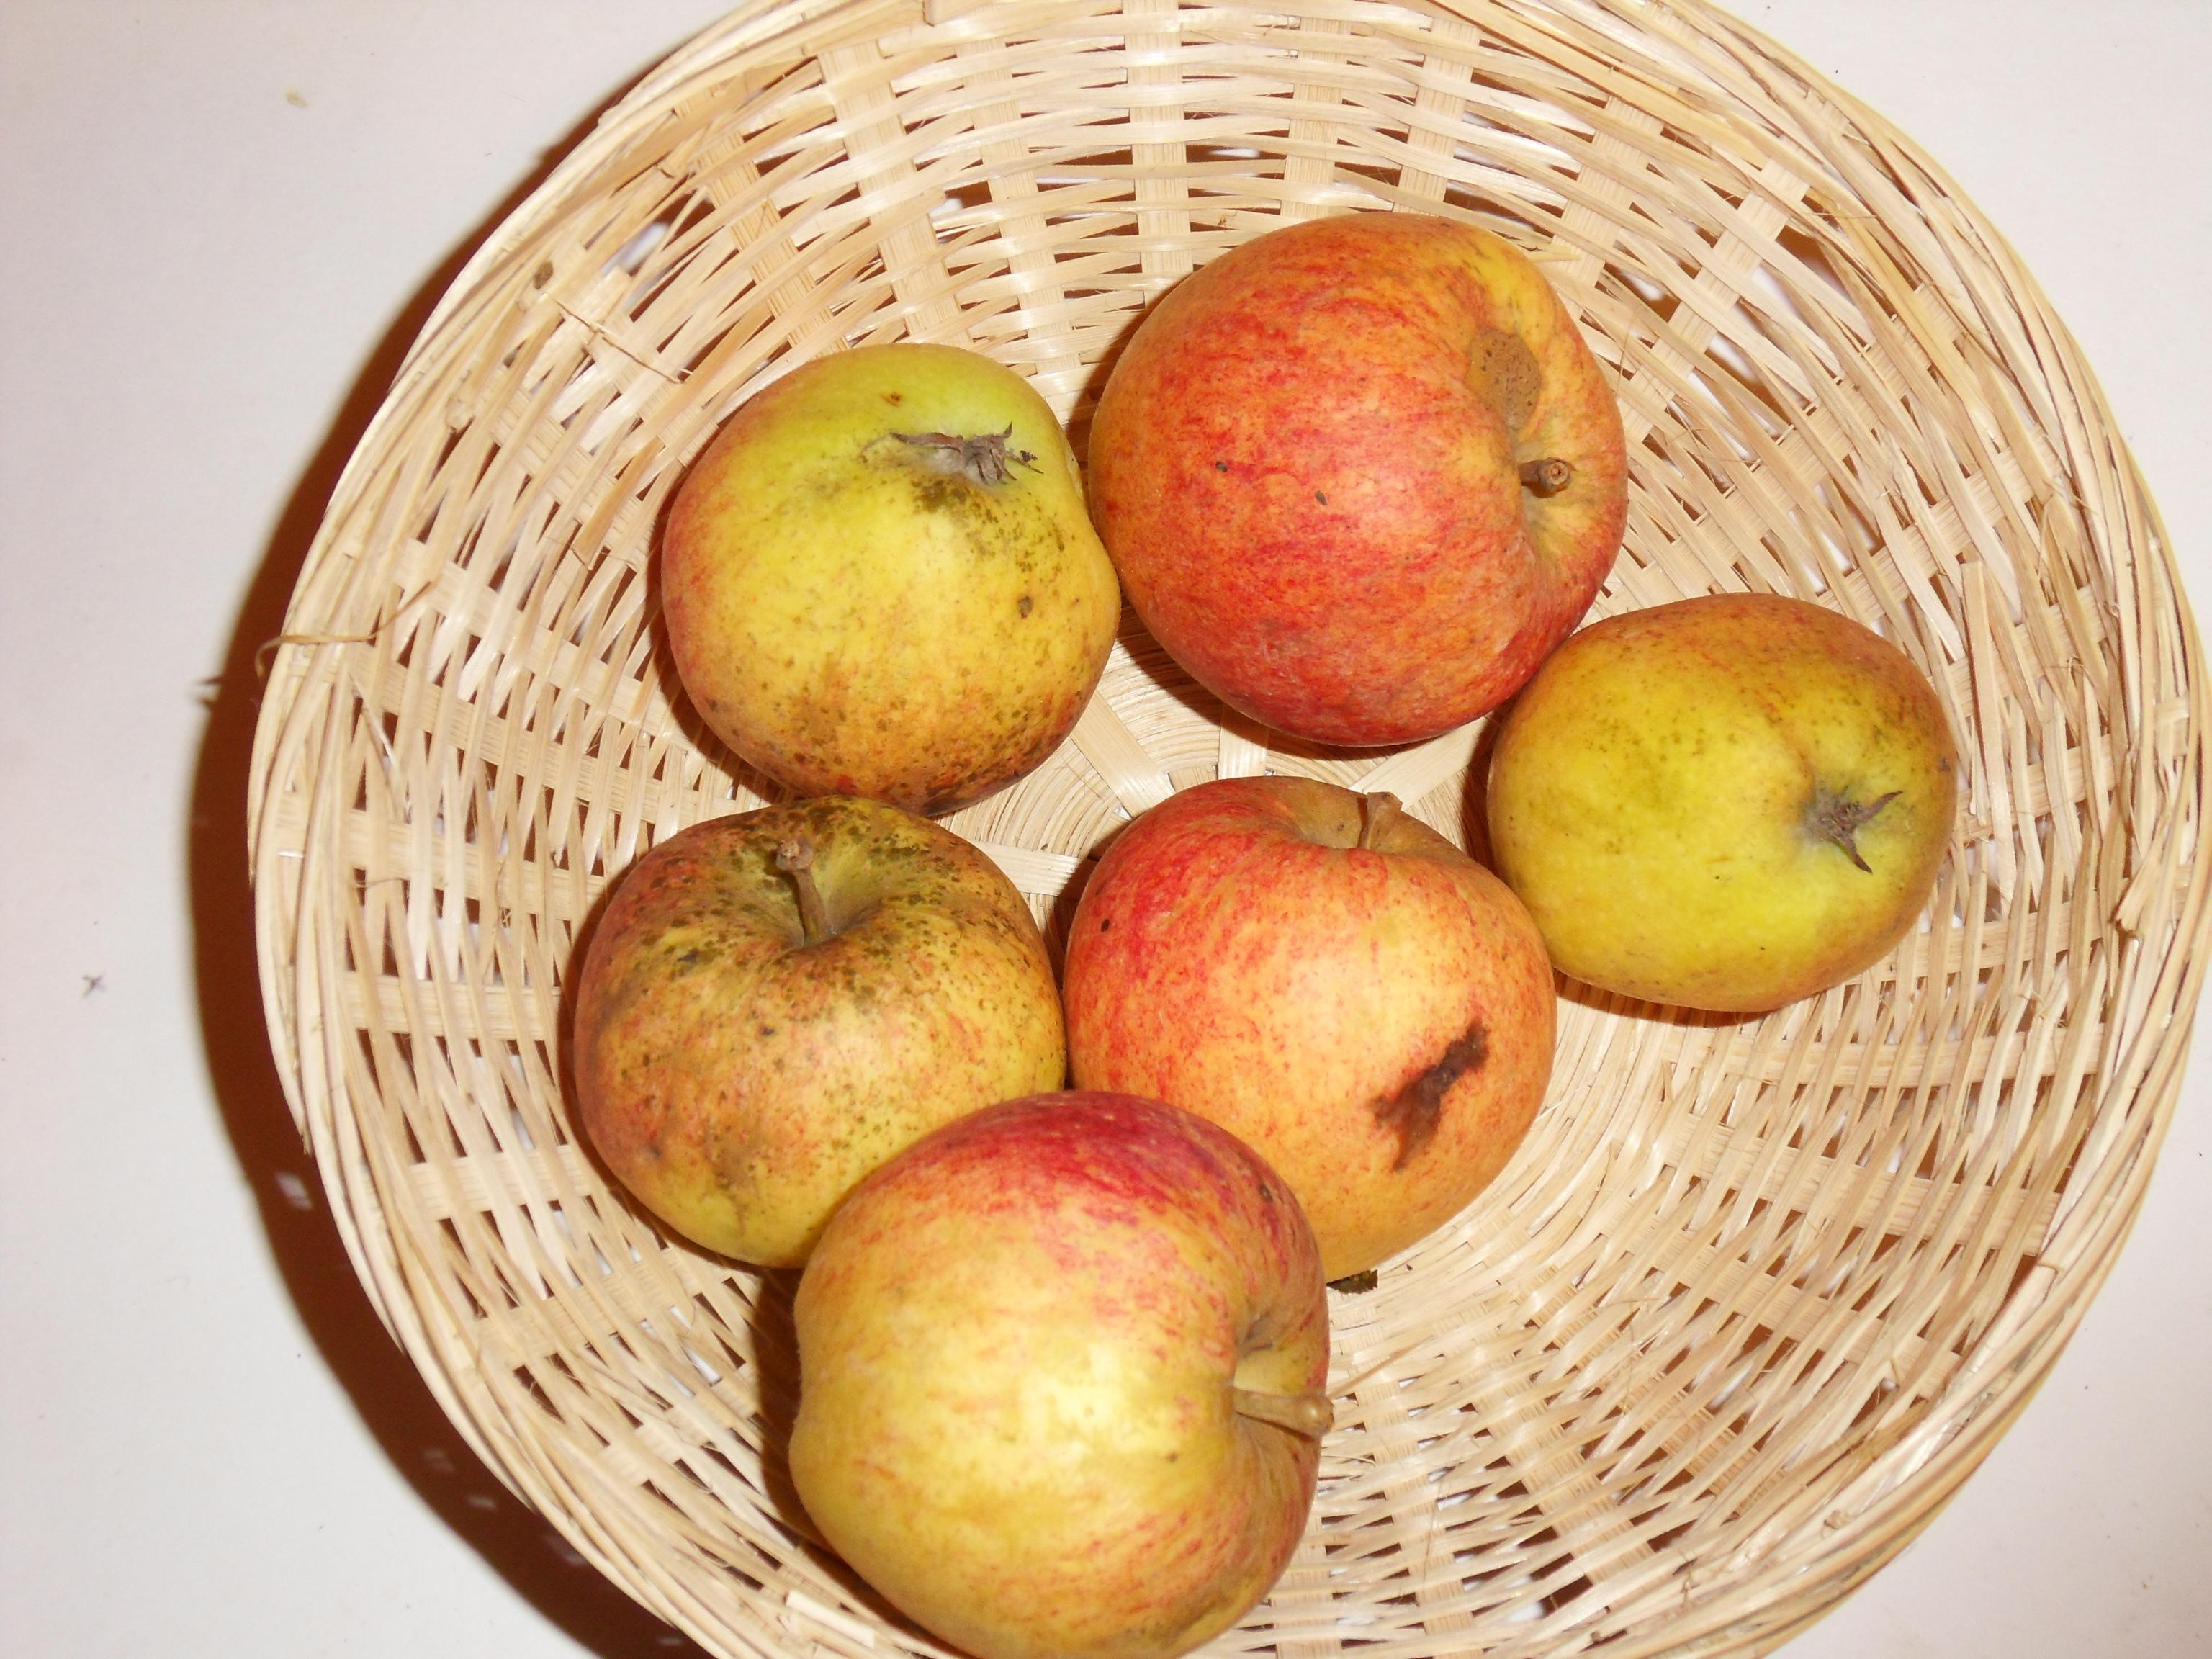 James Grieve (fruit).